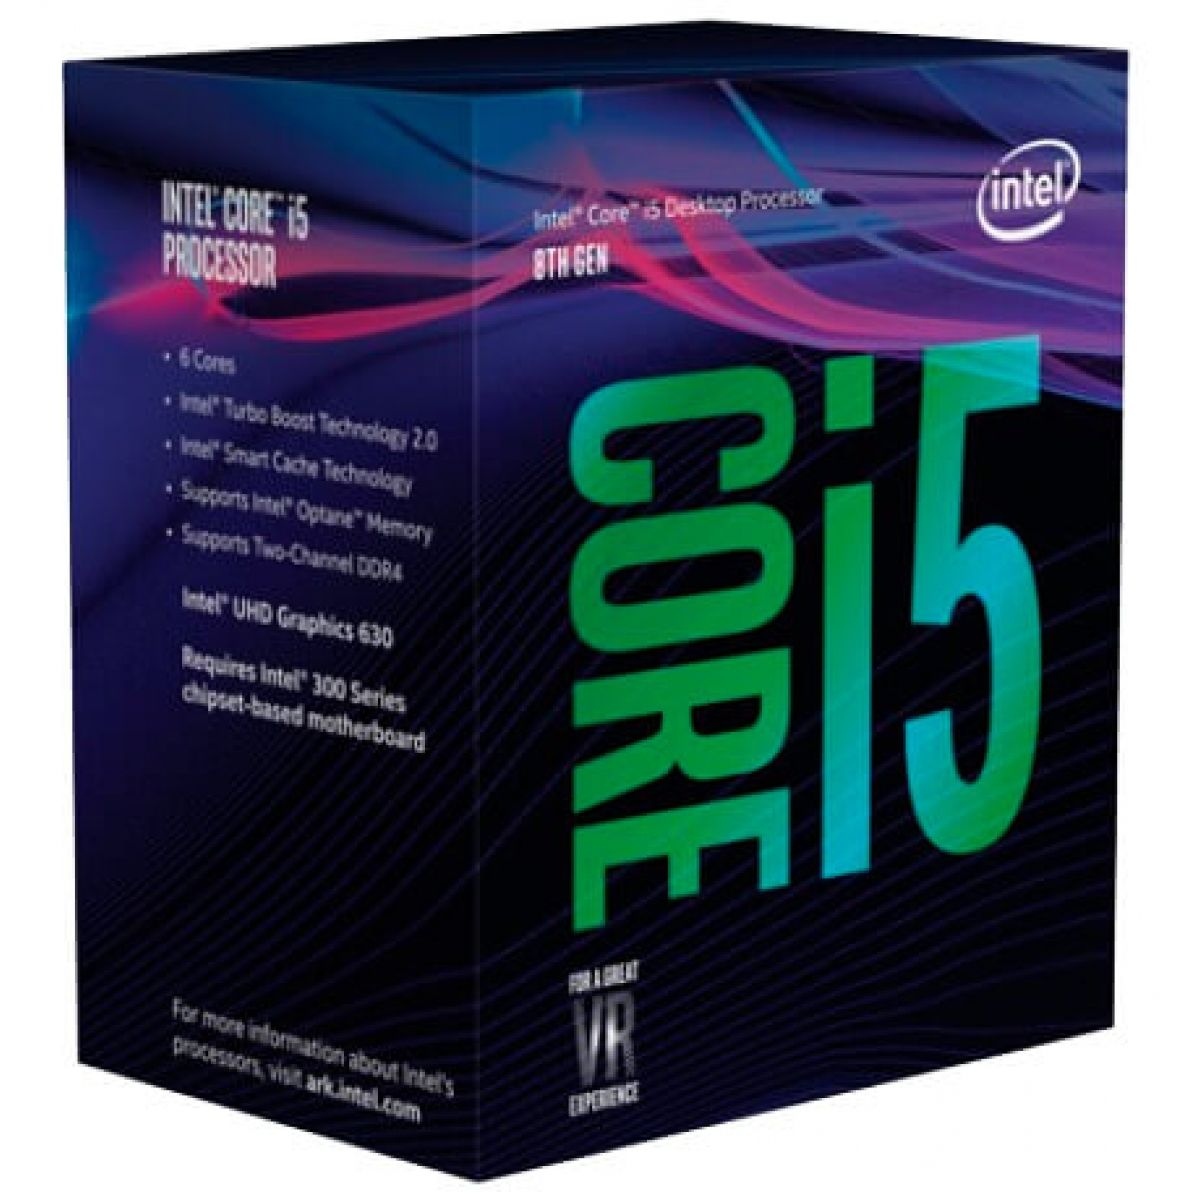 Processador Intel Core i5-8400 Coffee Lake 8Ger. 2.8GHz 9MB, LGA 1151 - BX80684I58400